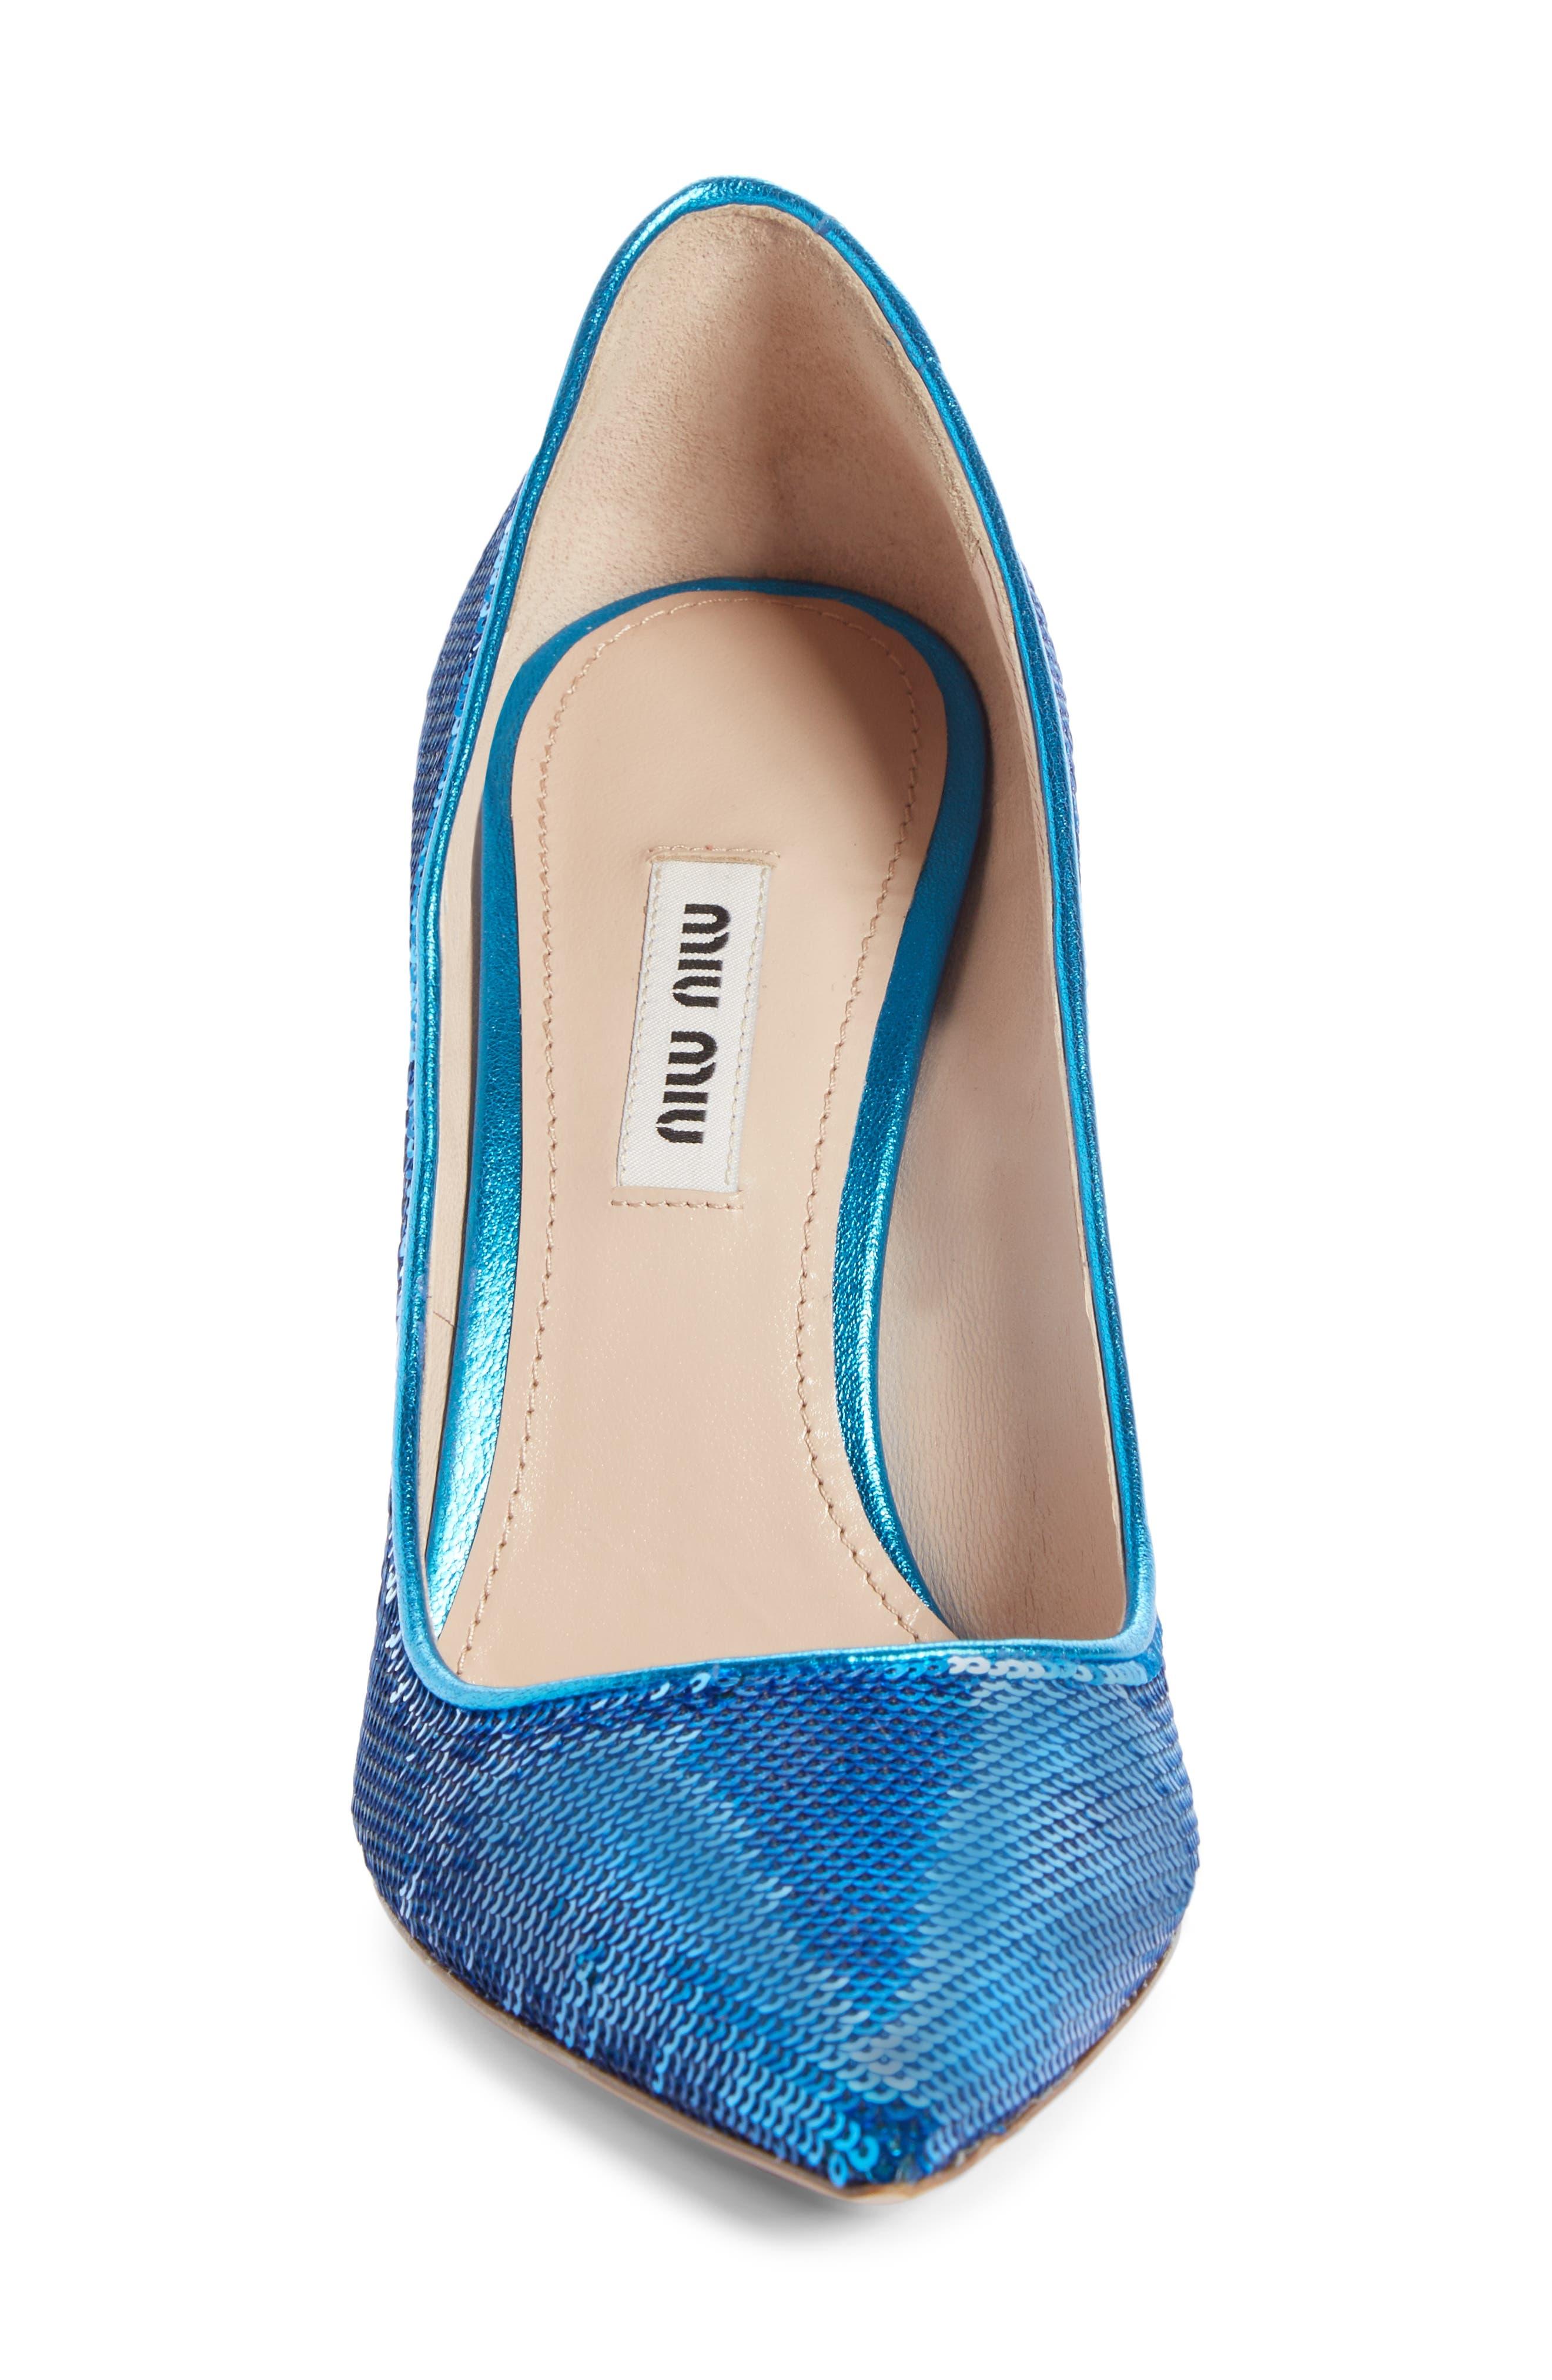 Sequin Pin Heel Pump,                             Alternate thumbnail 4, color,                             MAREA BLUE